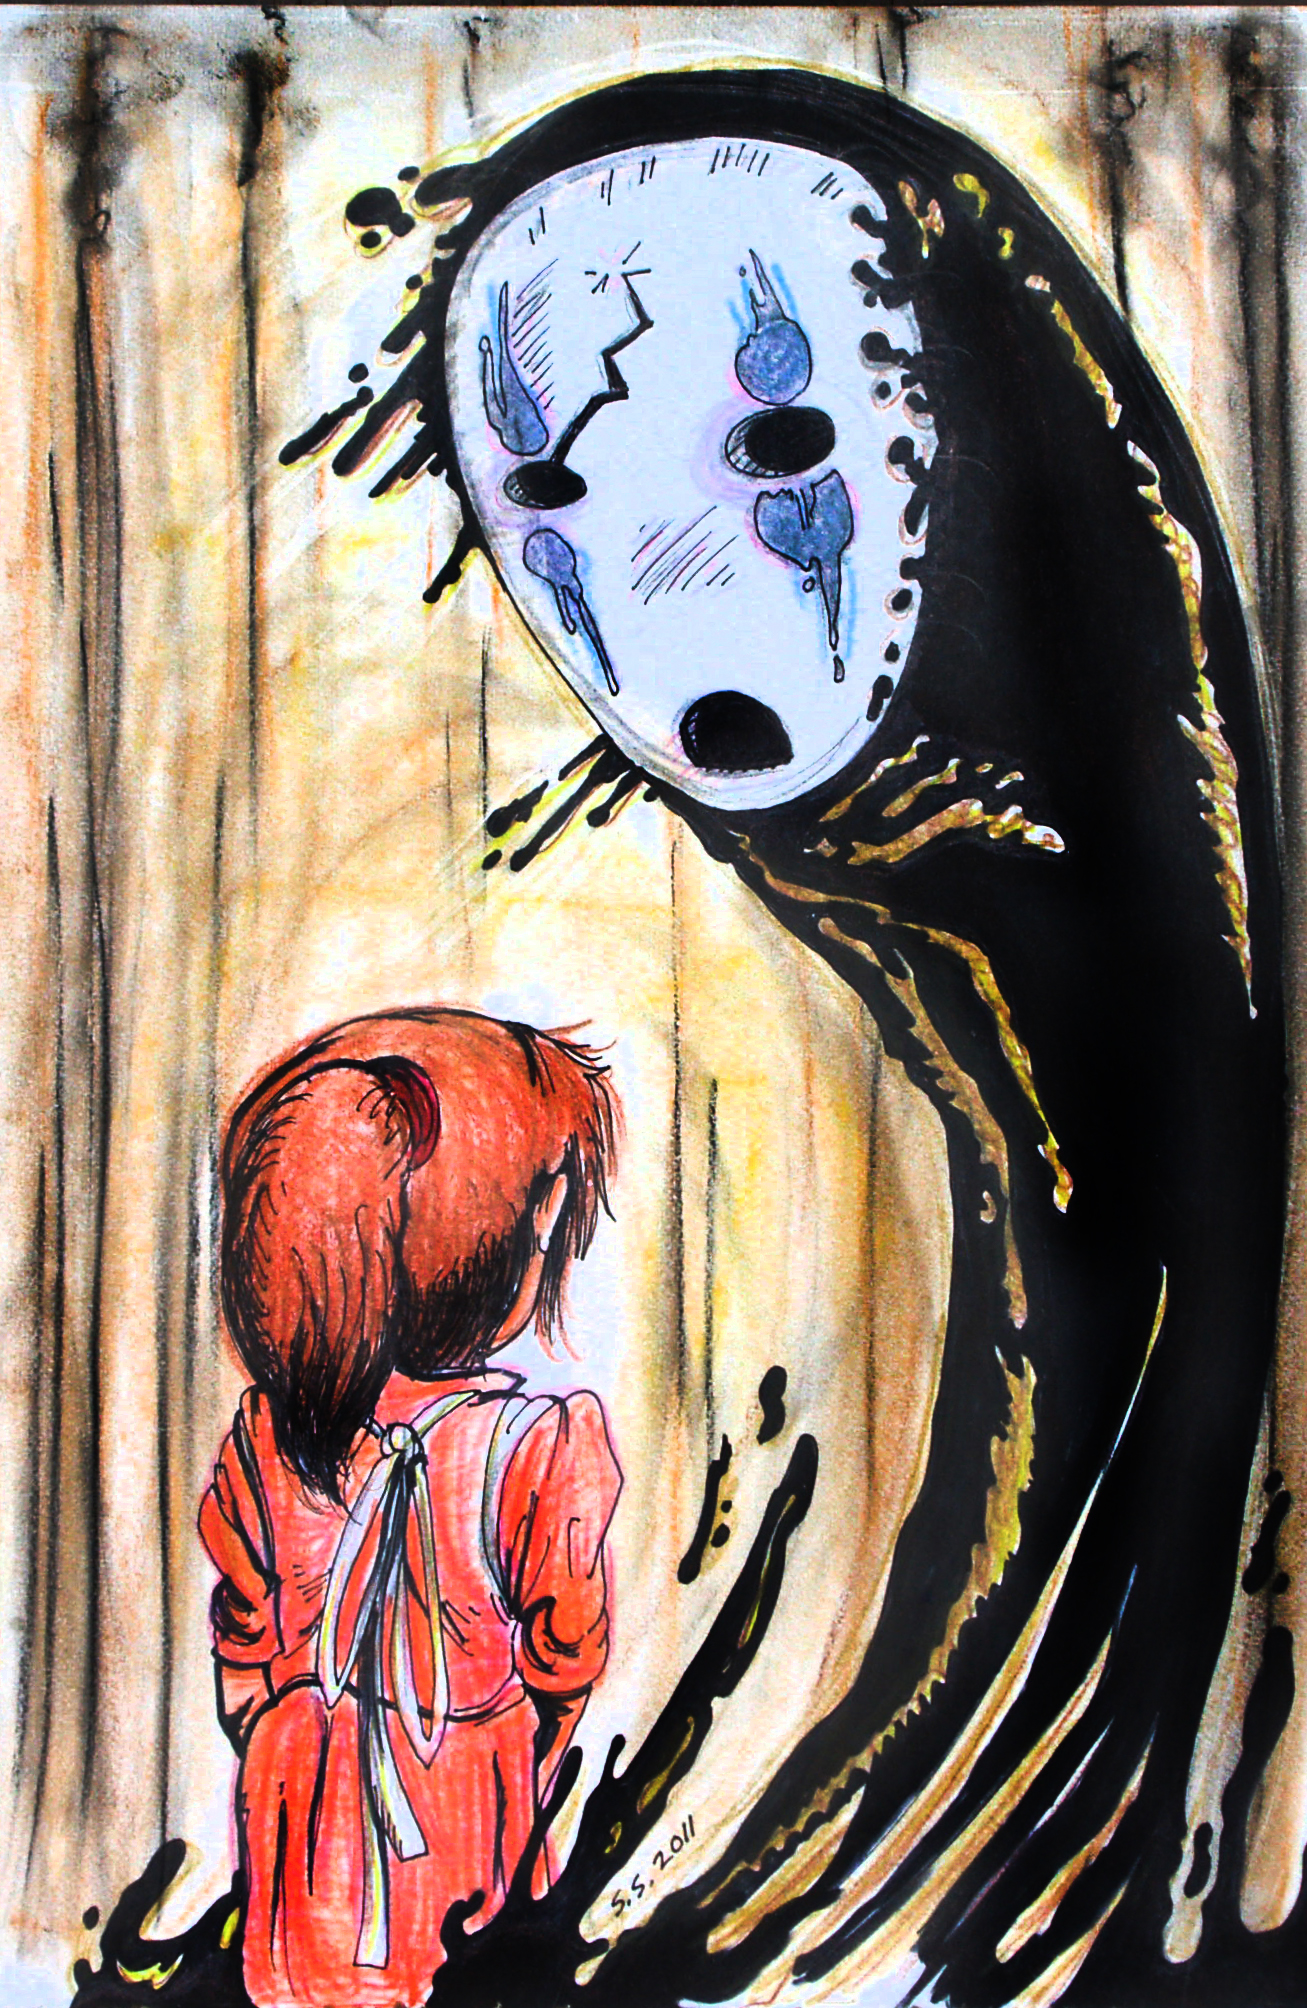 Chihiro meets No Face